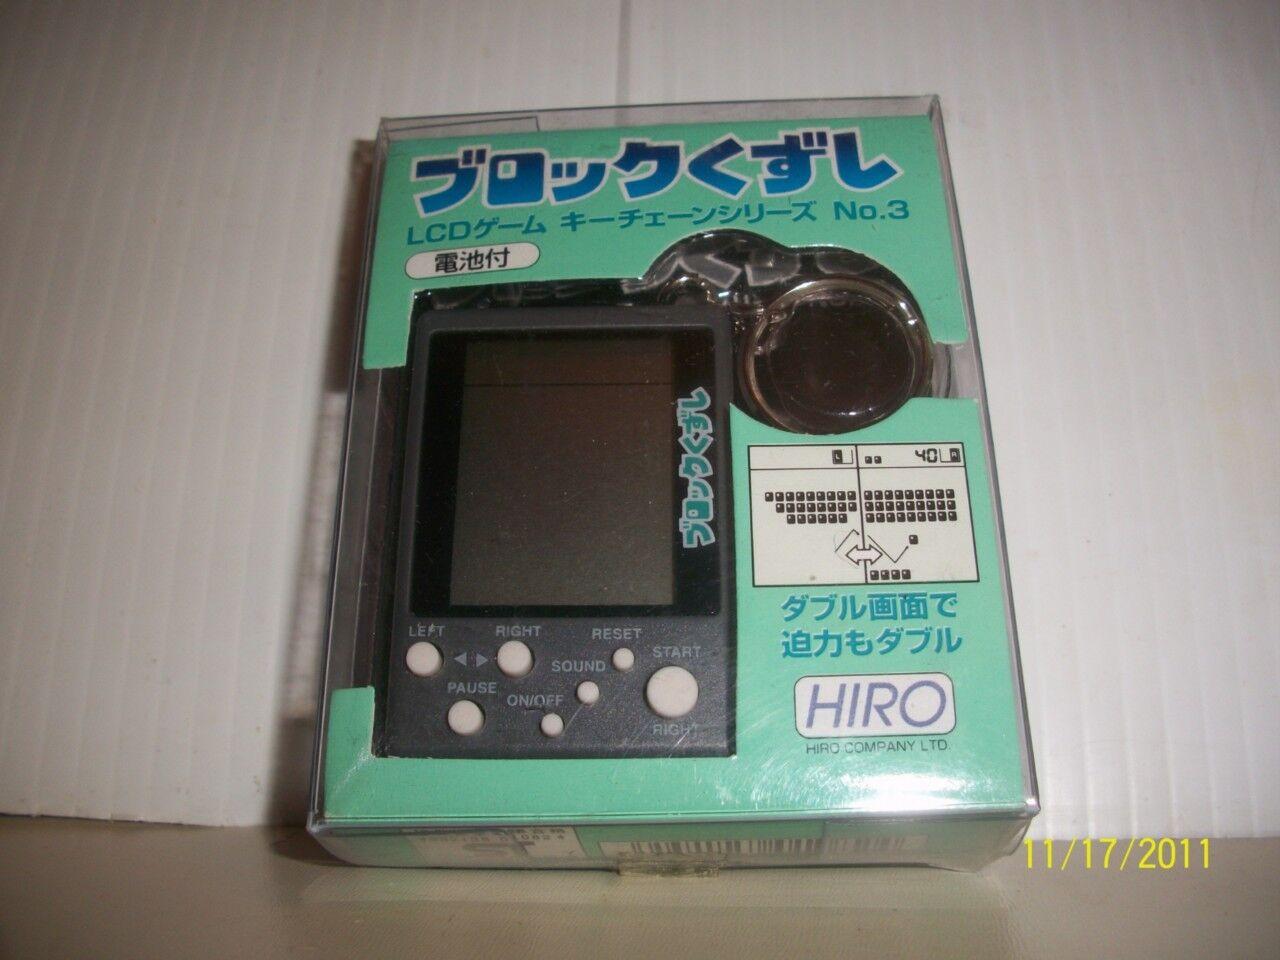 BREAKOUT KEYCHAIN GAME JAPANESE EDITION HIRO COMPANY 1997 NIB RARE COLLECTIBLE